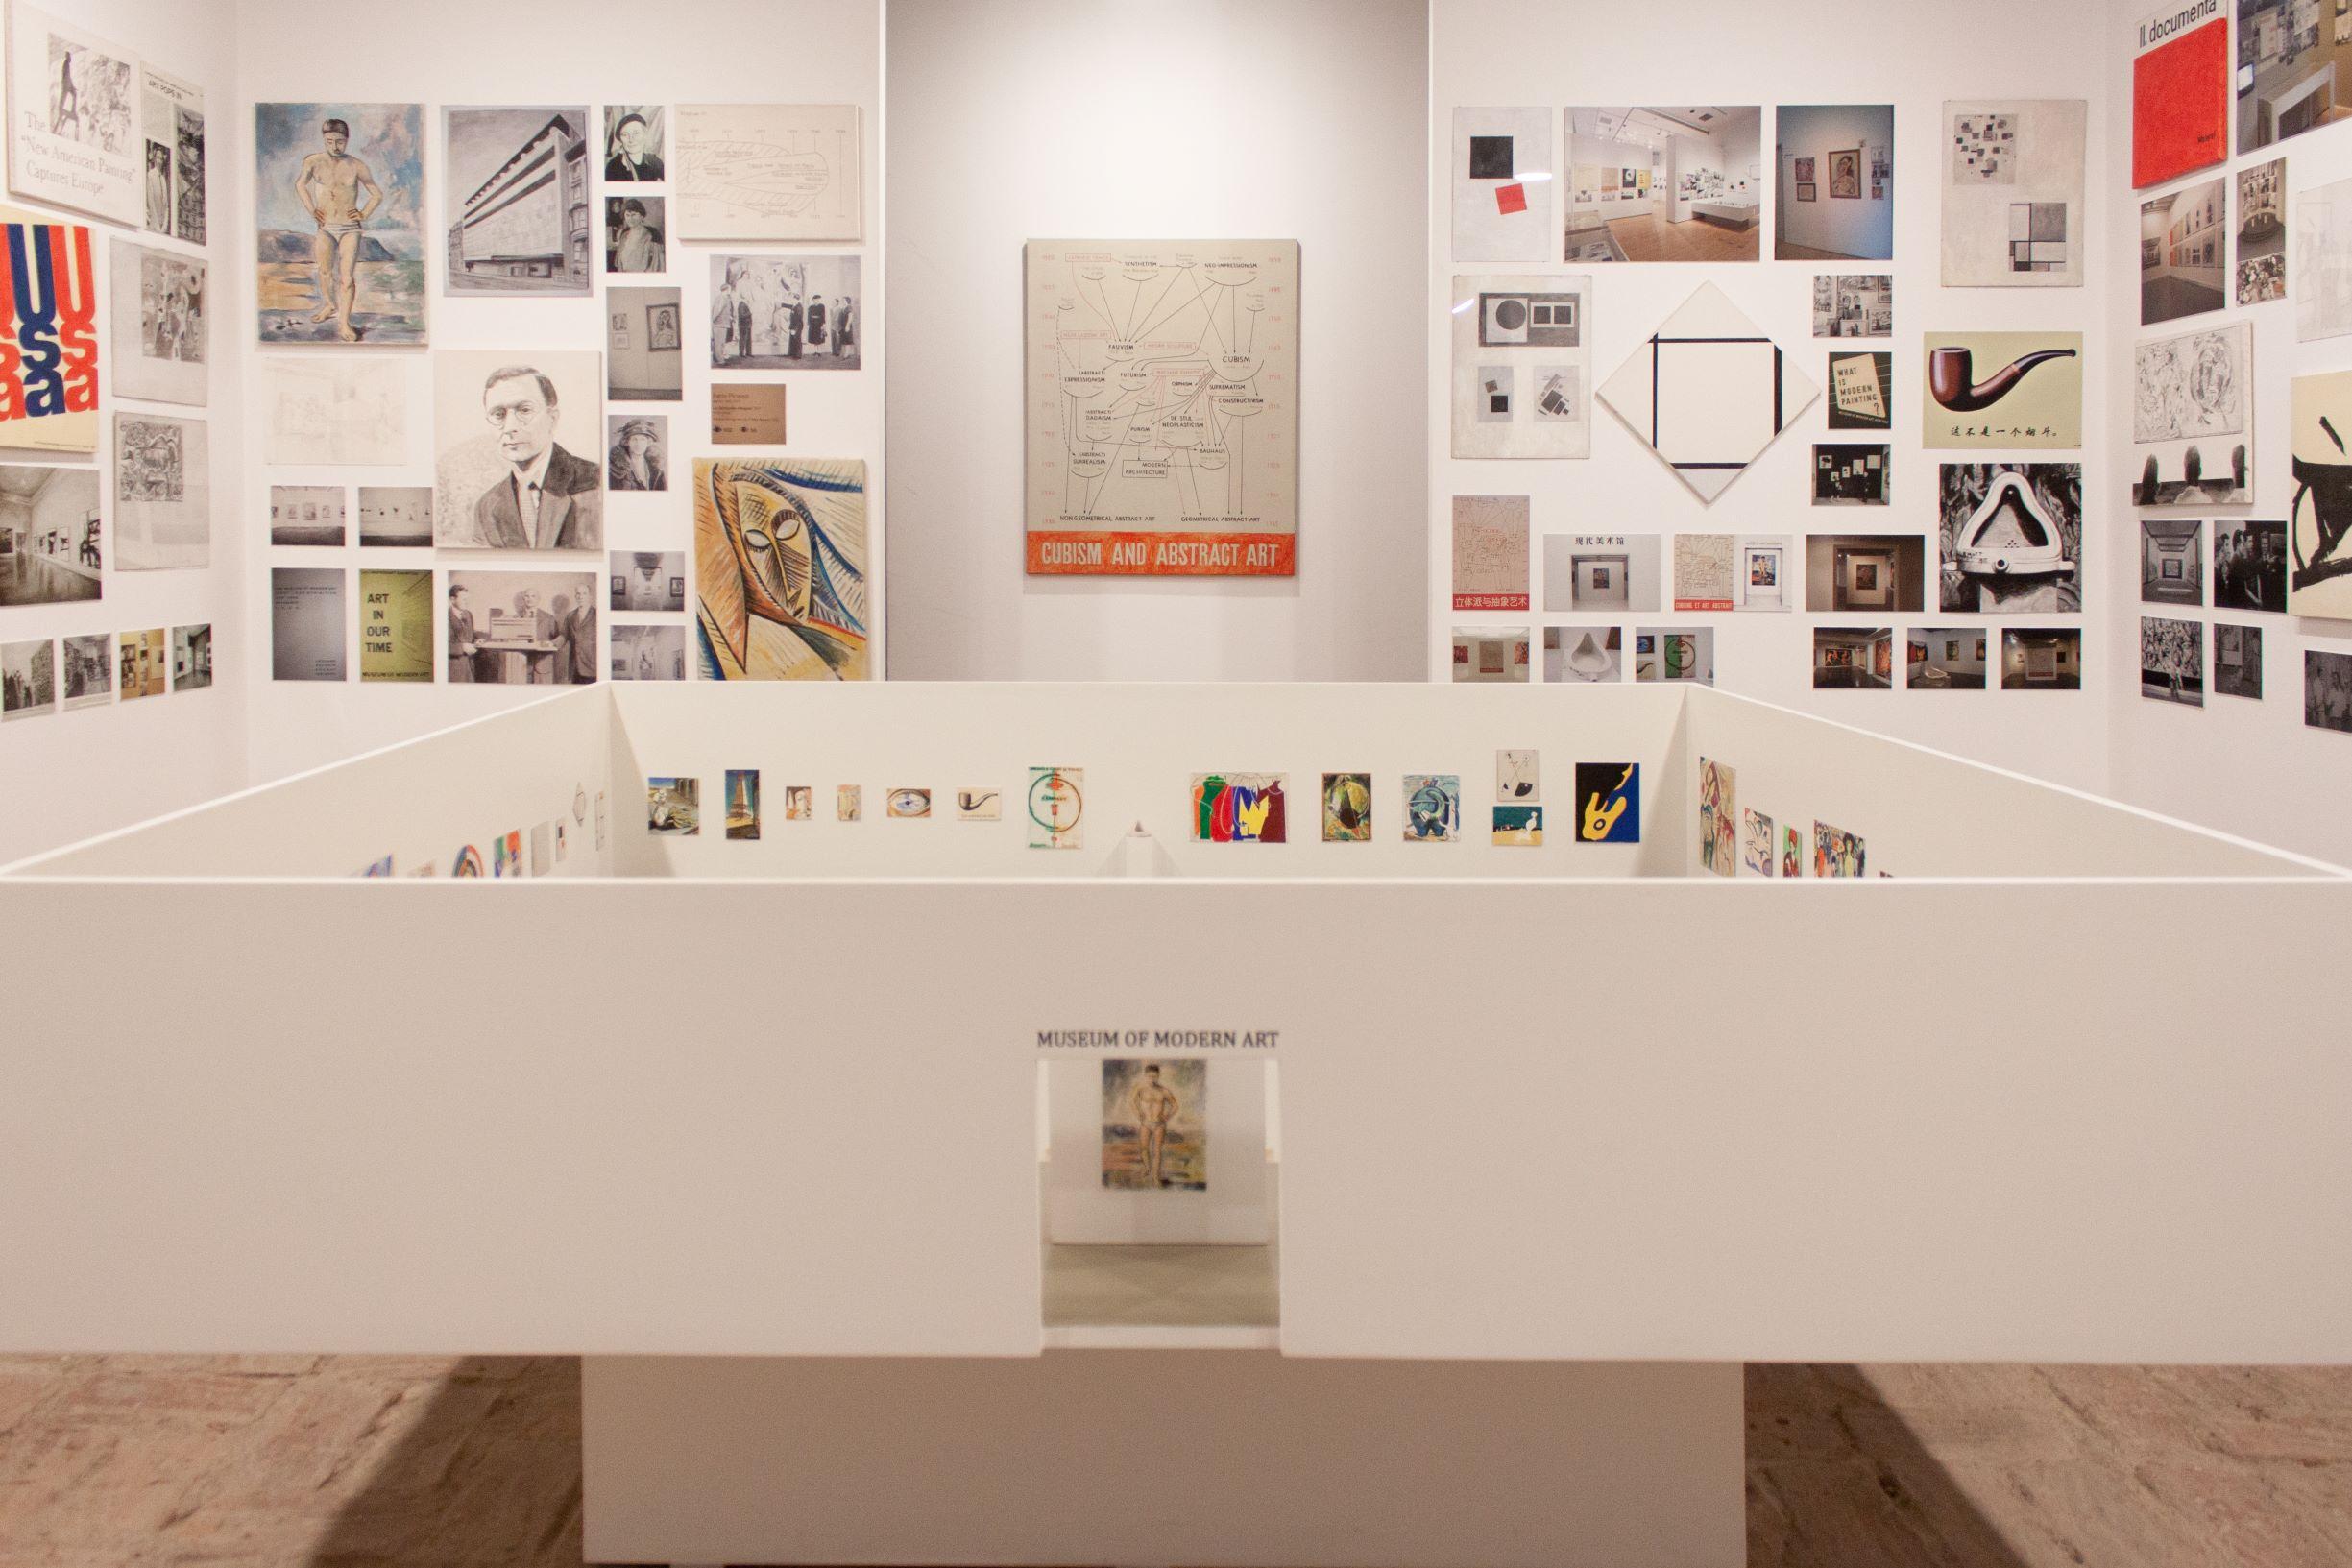 The permanent exhibition